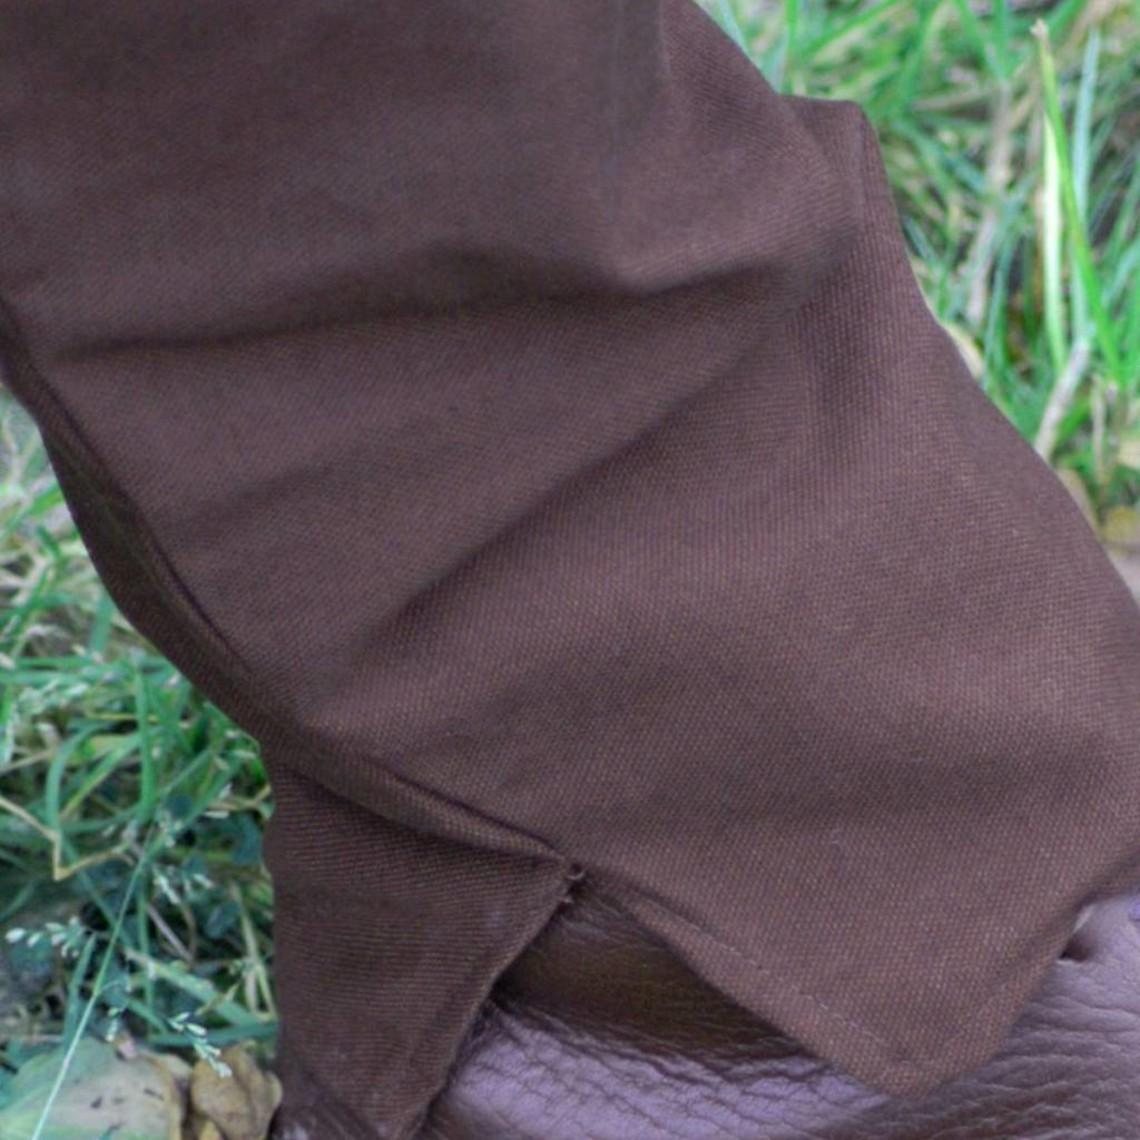 Calzoni vichinghi marroni